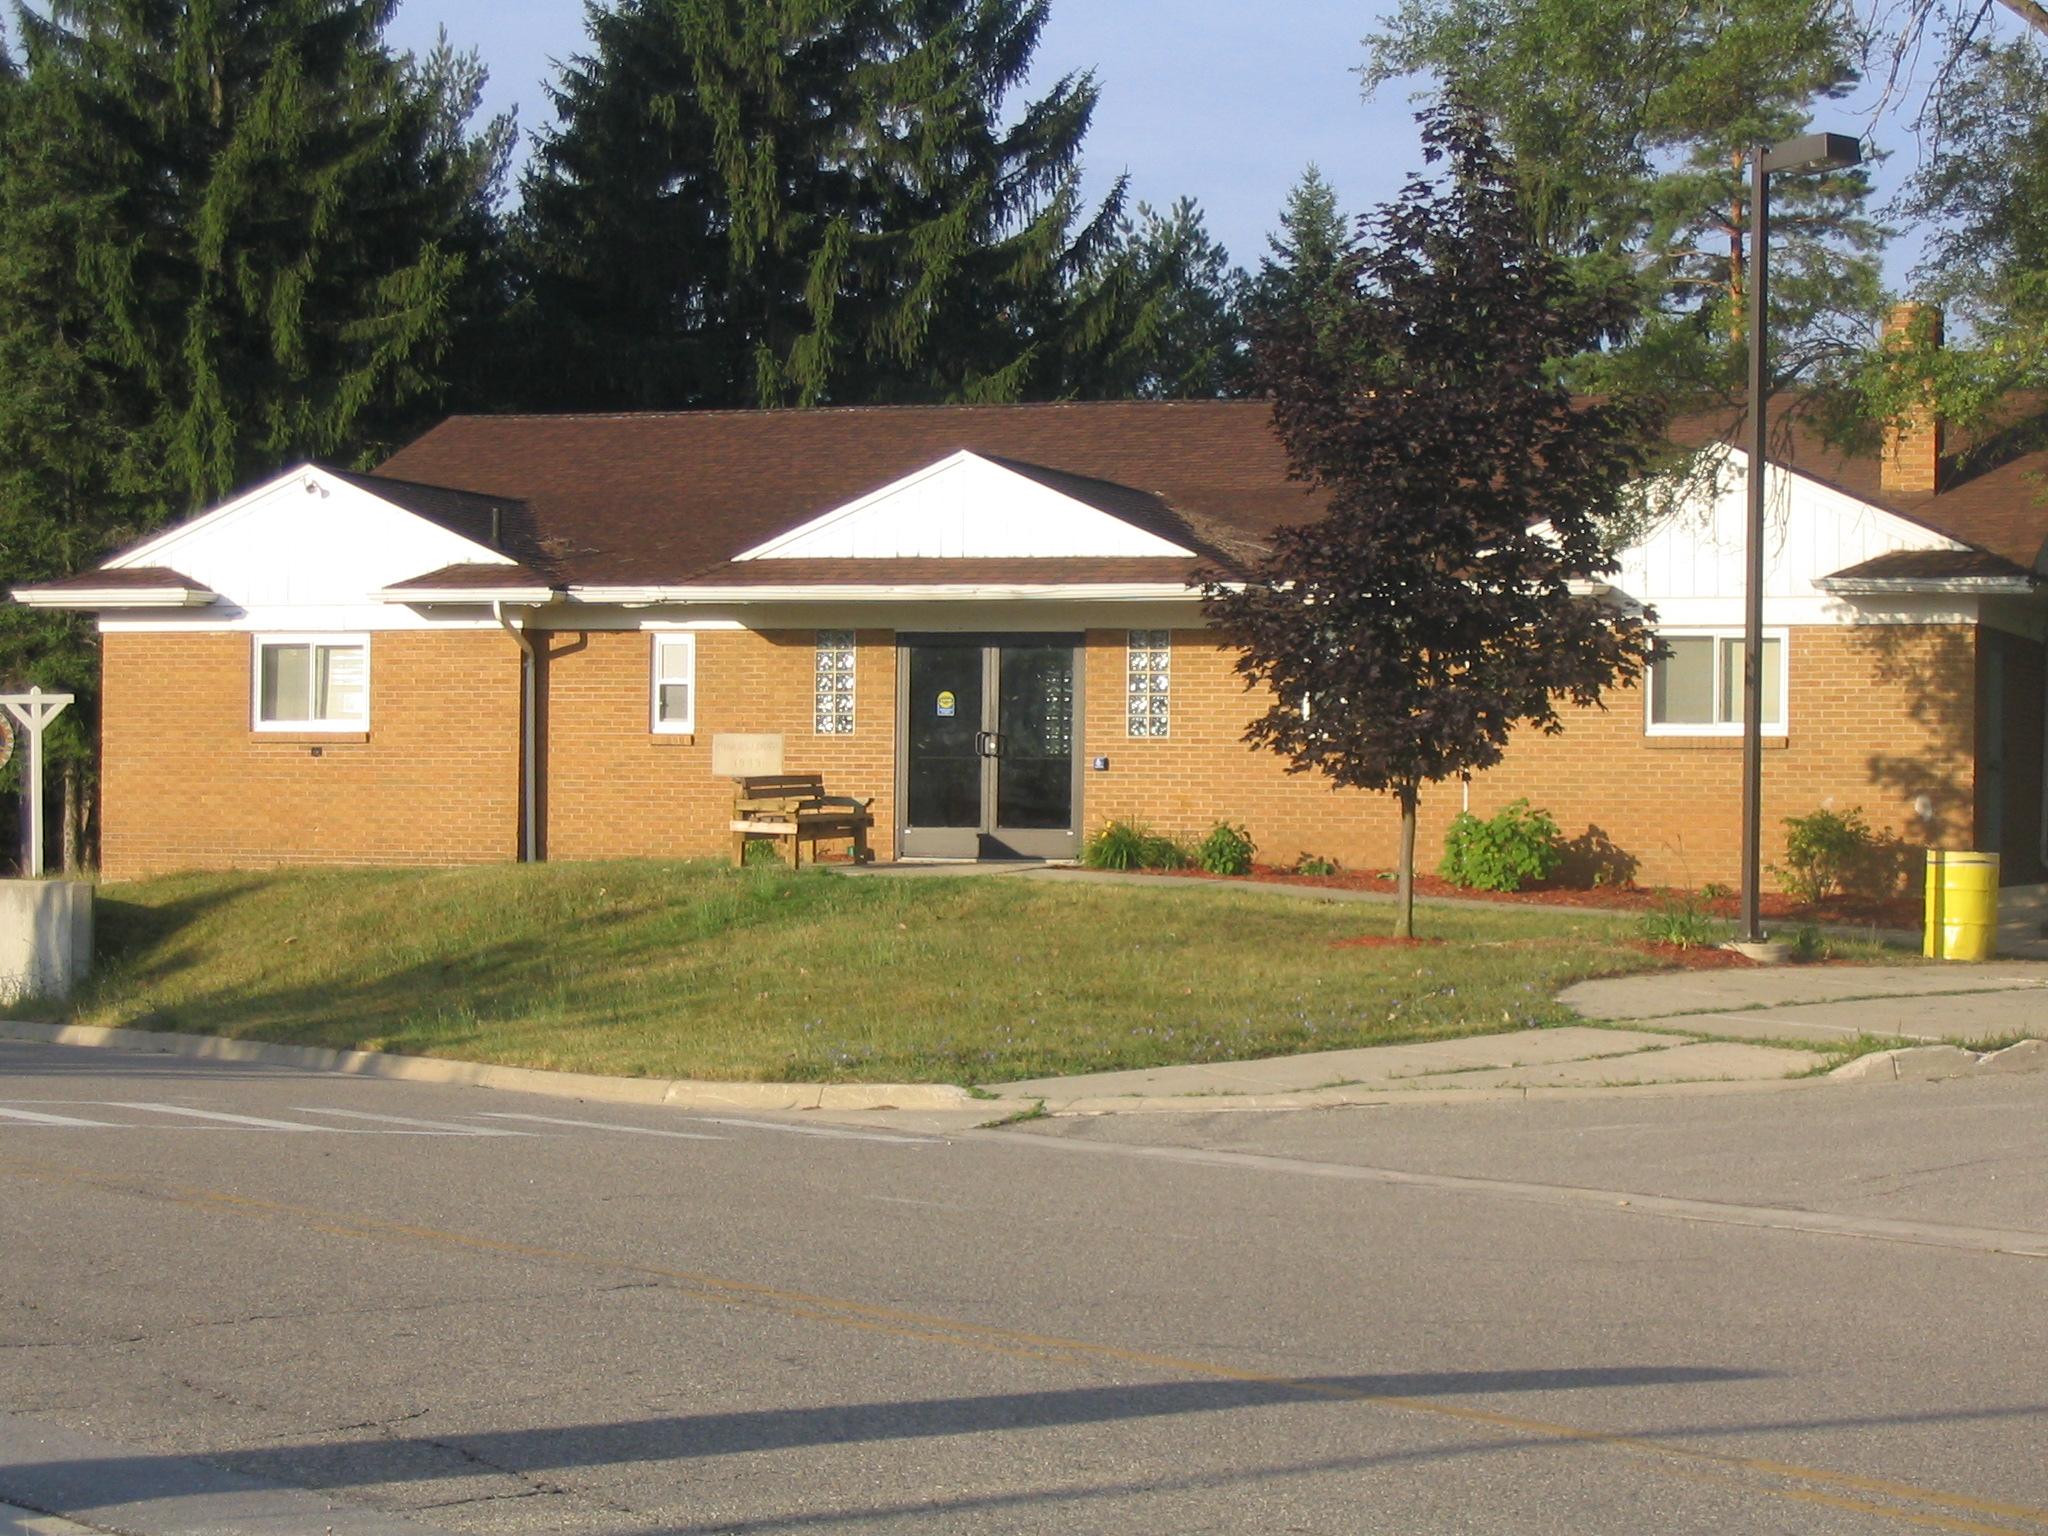 Michigan genesee county clio - Rogers Lodge